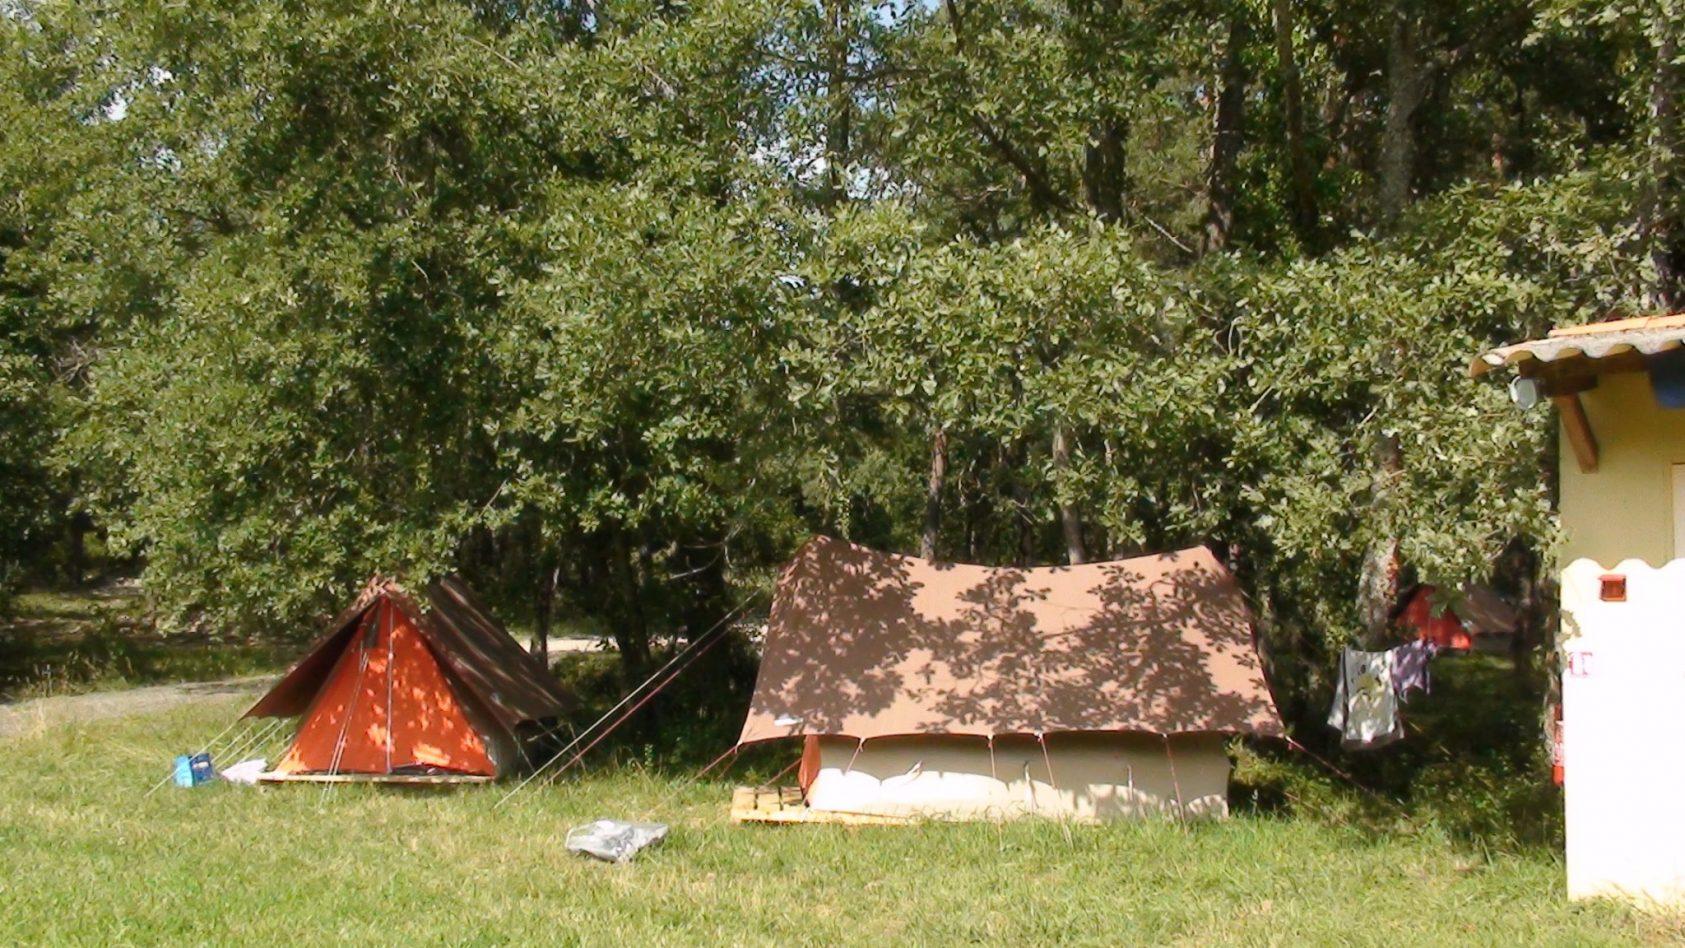 canadese tenten west weide